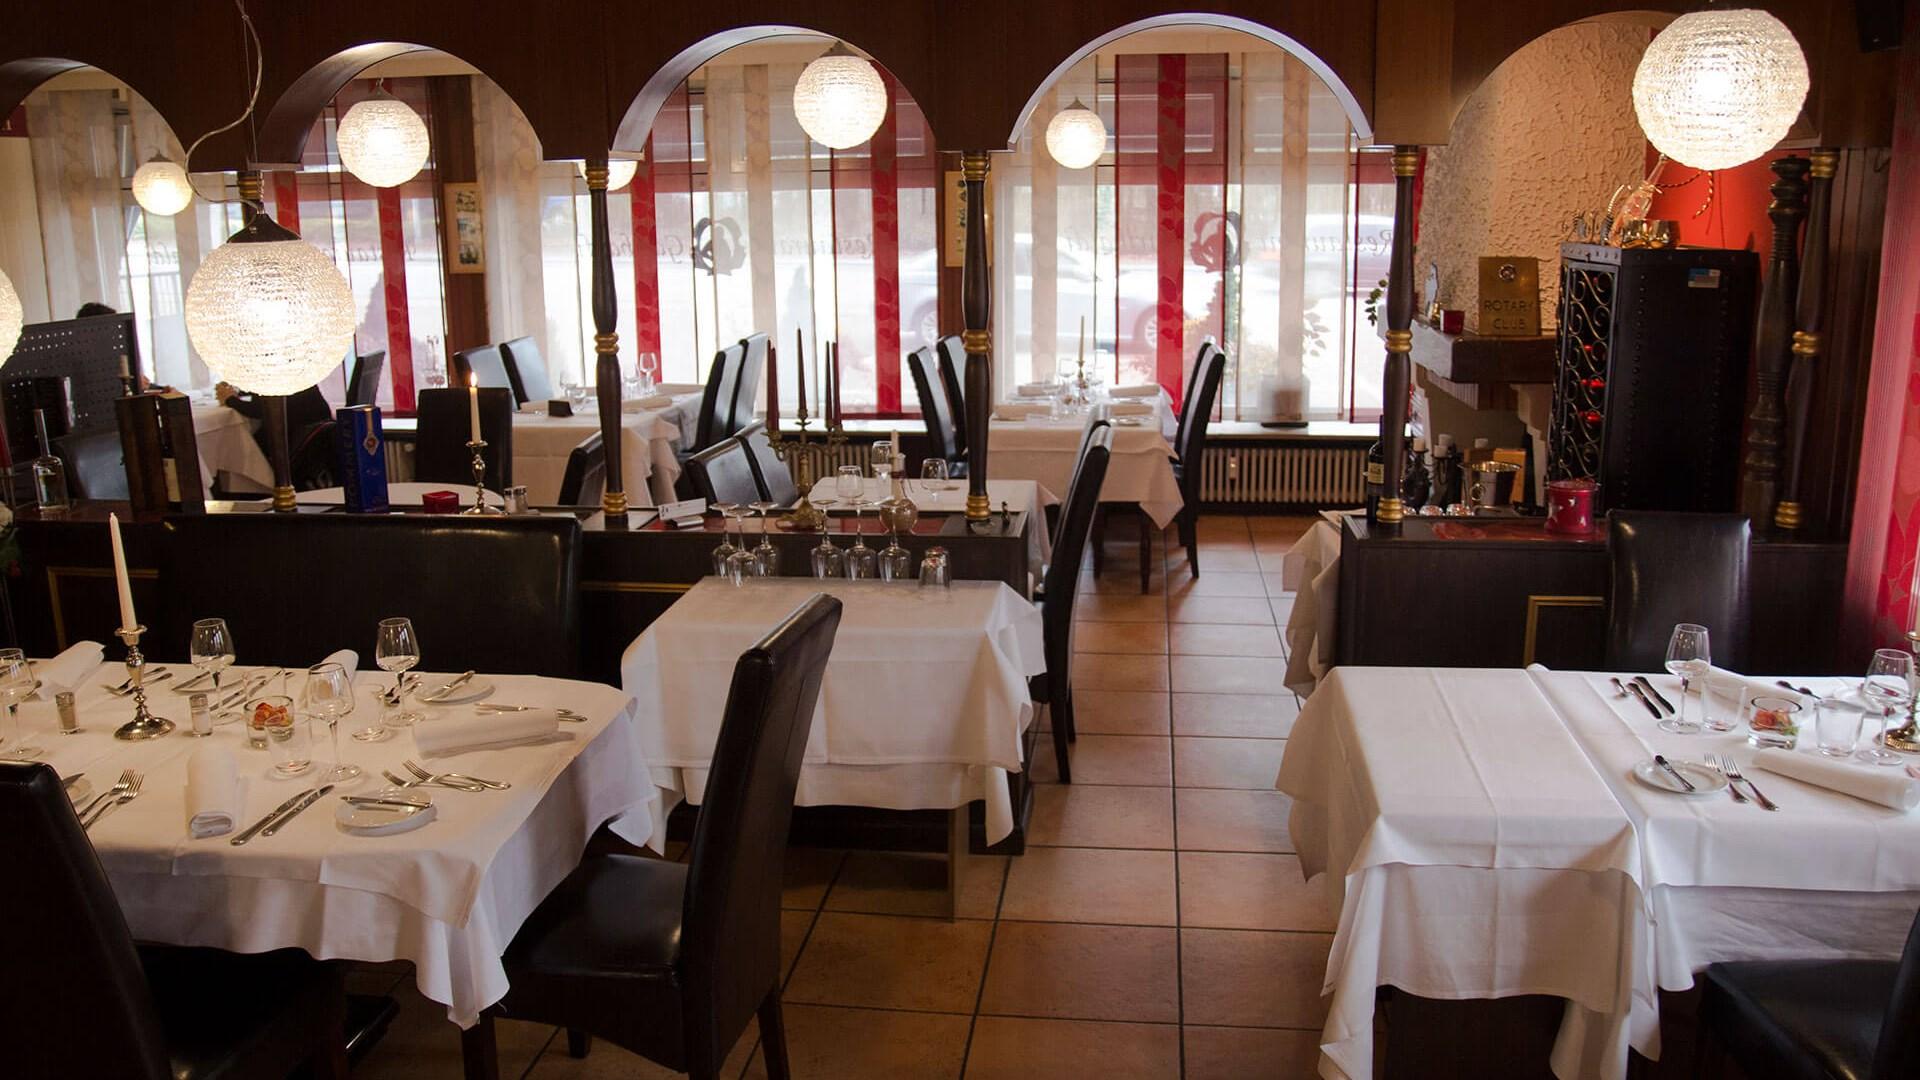 Willkommen - Restaurant Garibaldi - Dillingen